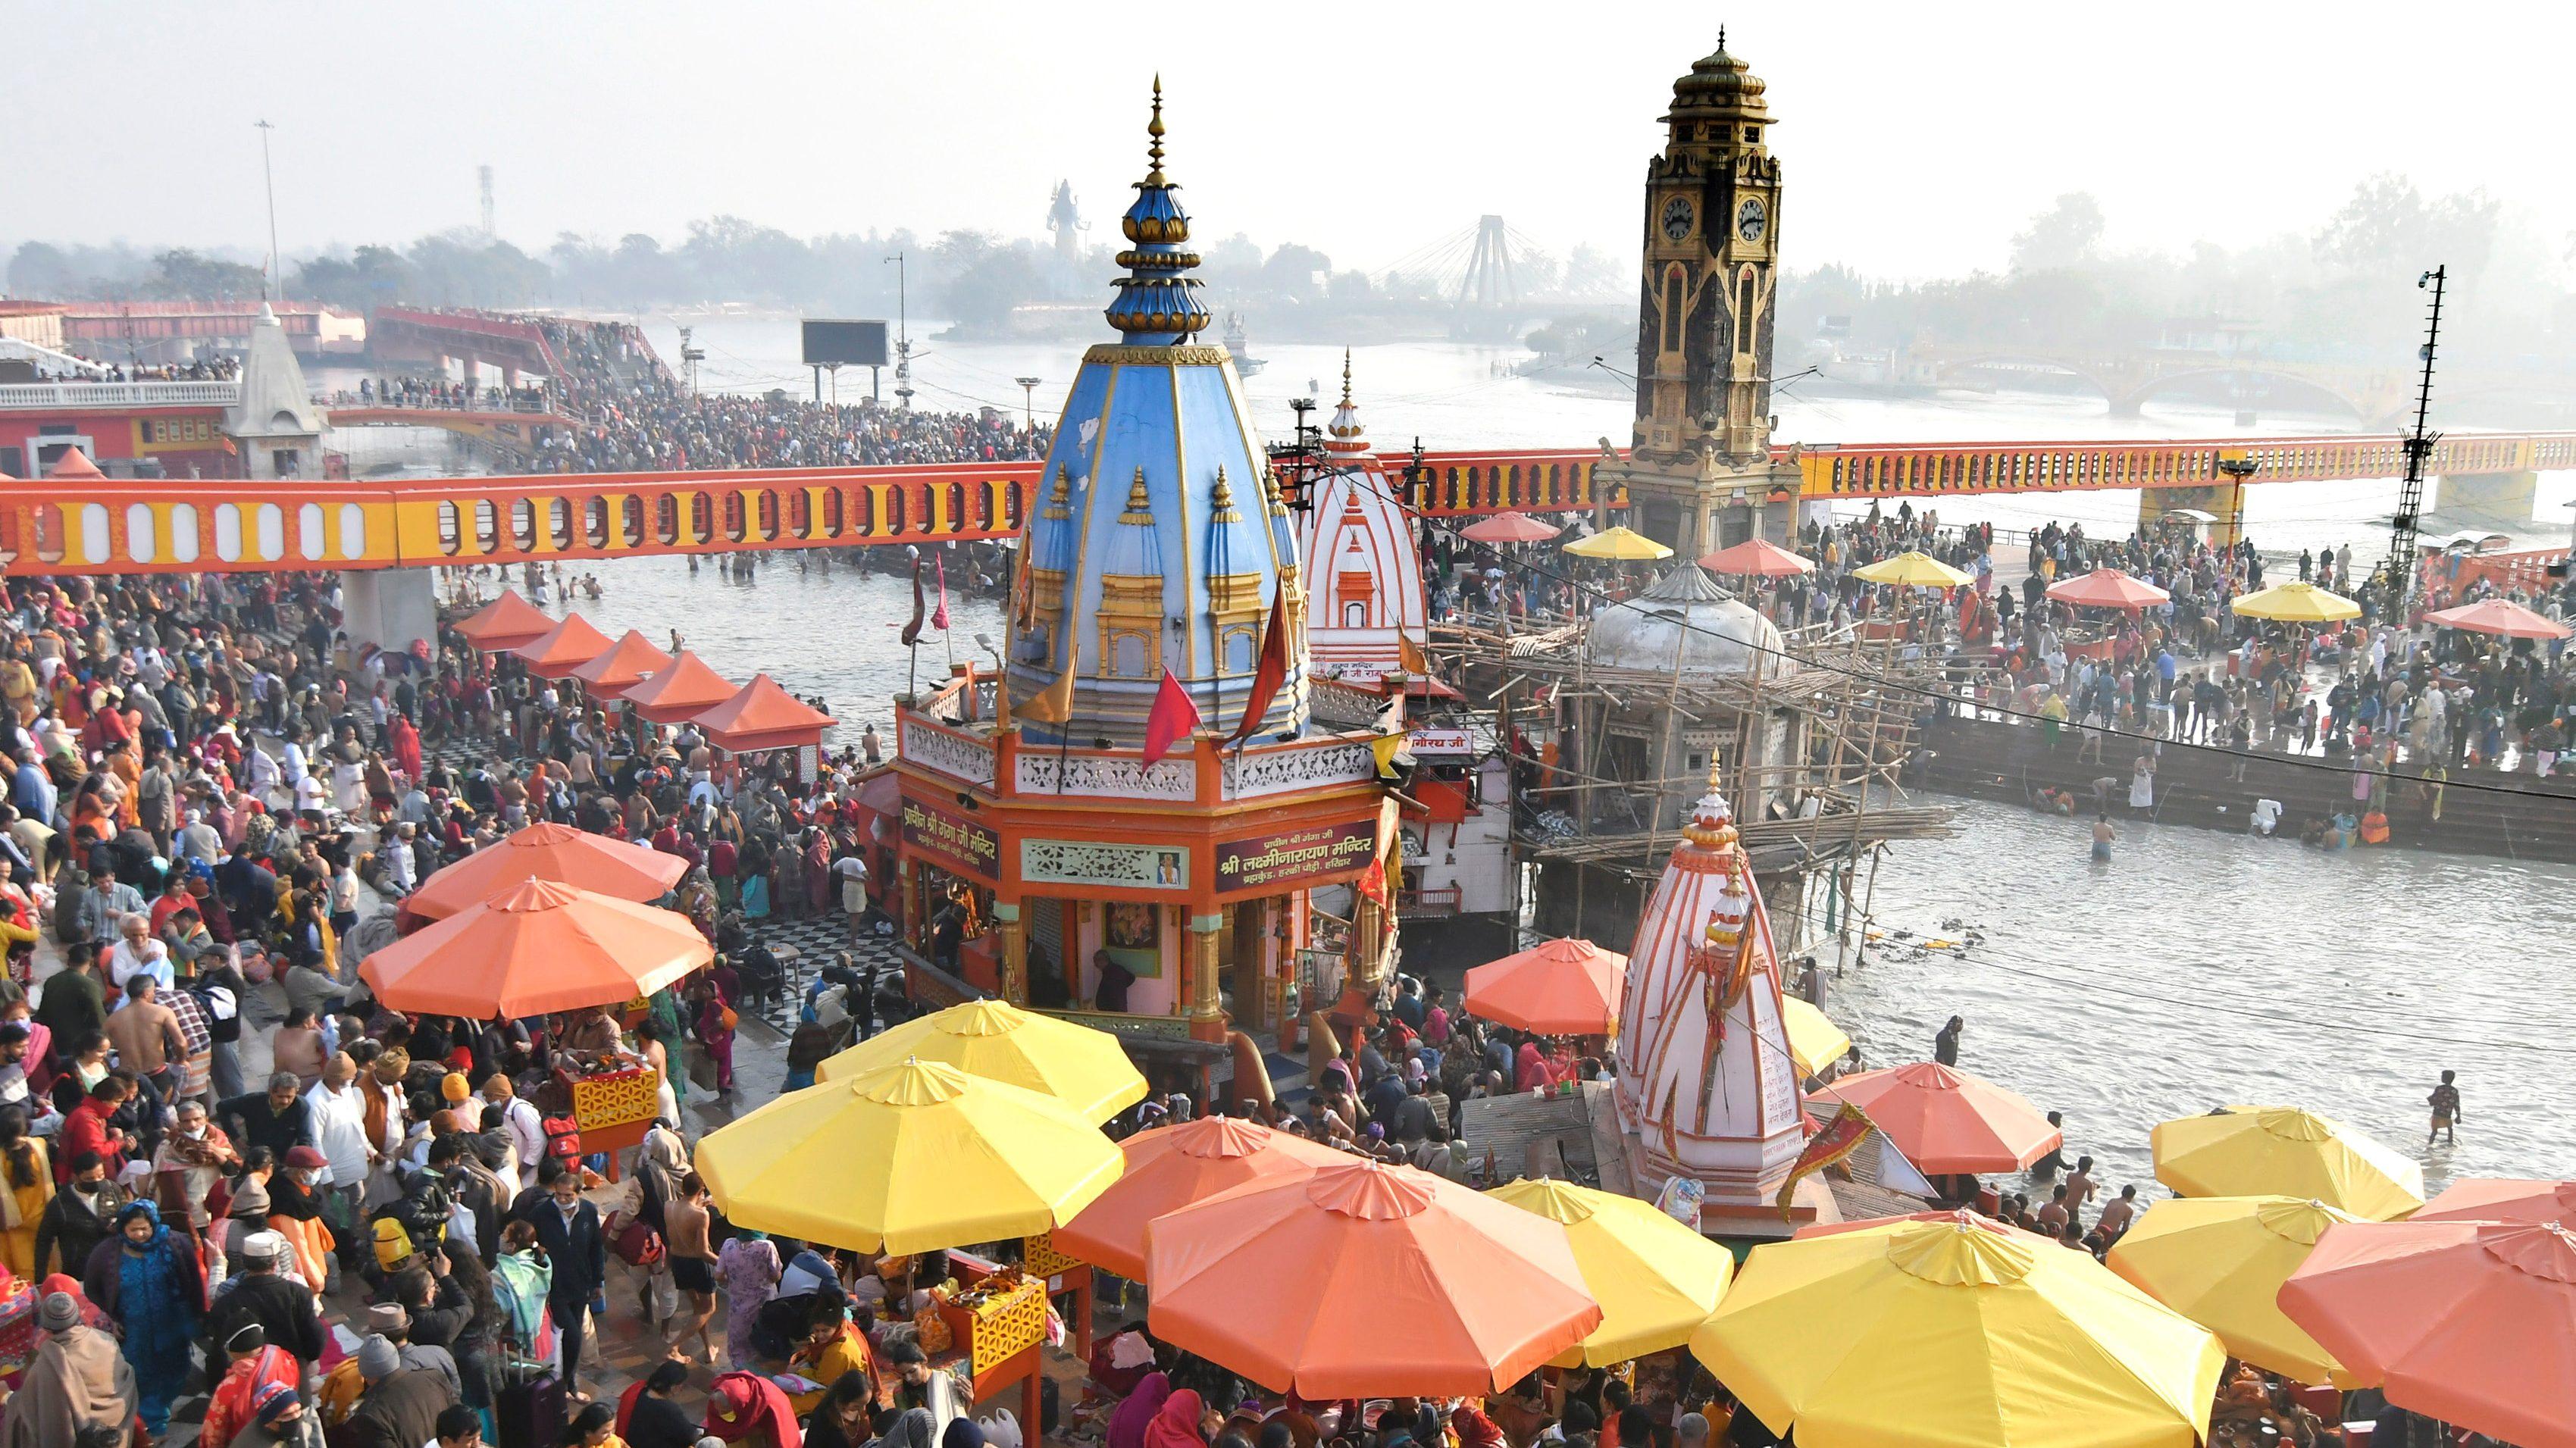 Hindu devotees gather to take a holy dip during religious Kumbh Mela in Haridwar